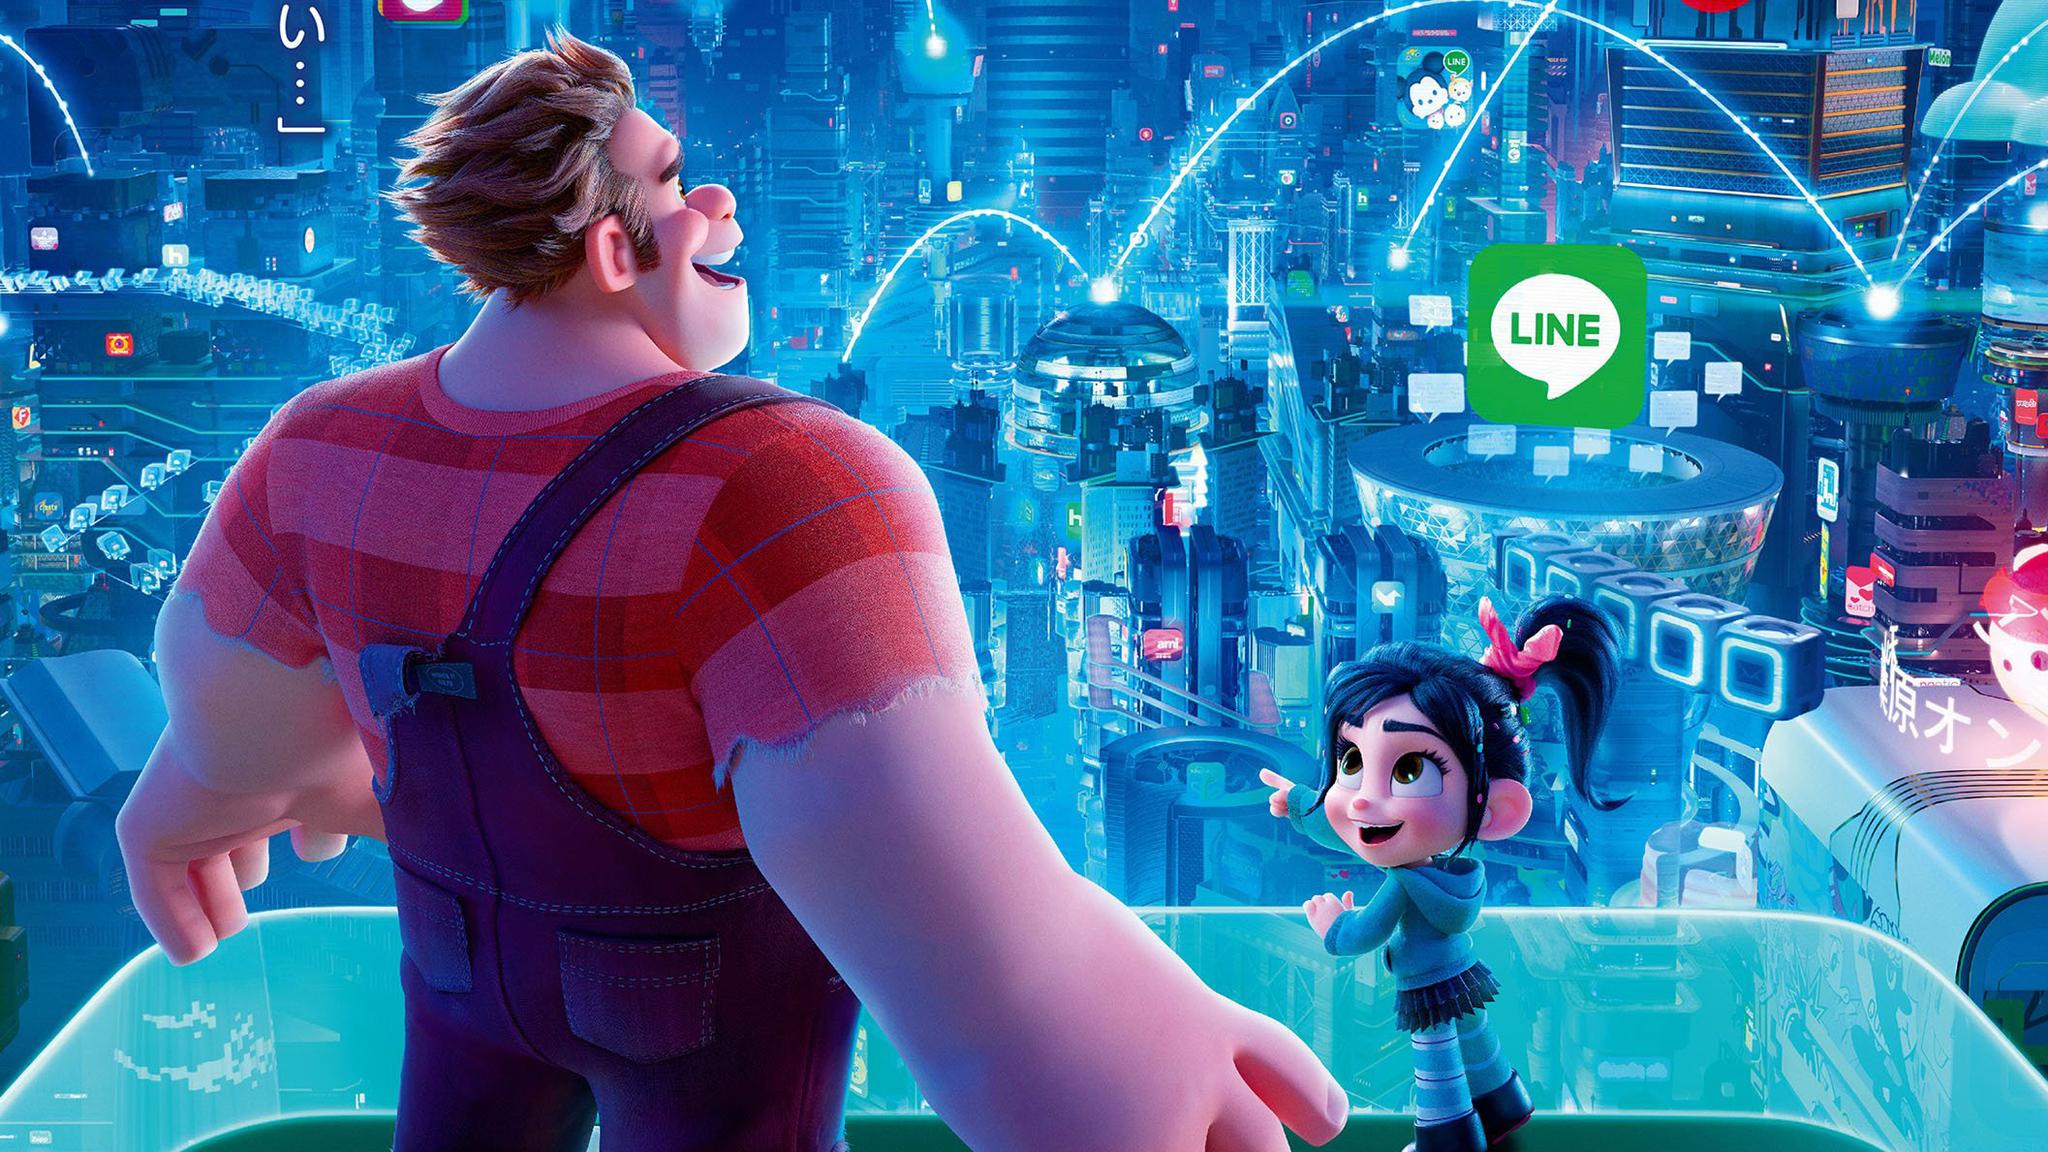 Wreck It Ralph Animation Movie 4k Hd Desktop Wallpaper For: 2048x1152 Ralph Breaks The Internet Wreck It Ralph 2